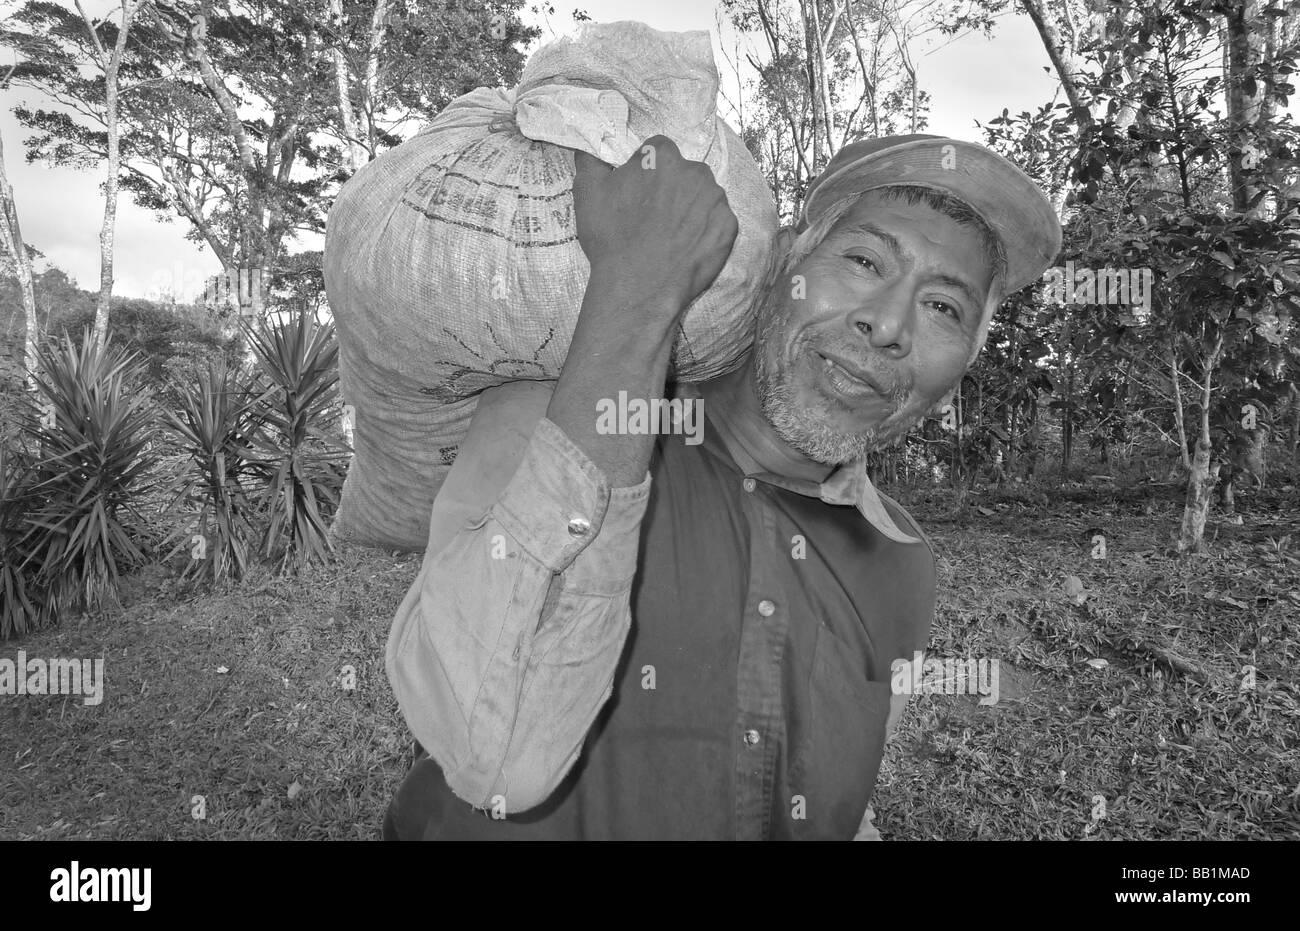 Nicaragua matagalpa central latin america latino coffee farm picker smiling nicaraguan man portrait with heavy coffee - Stock Image